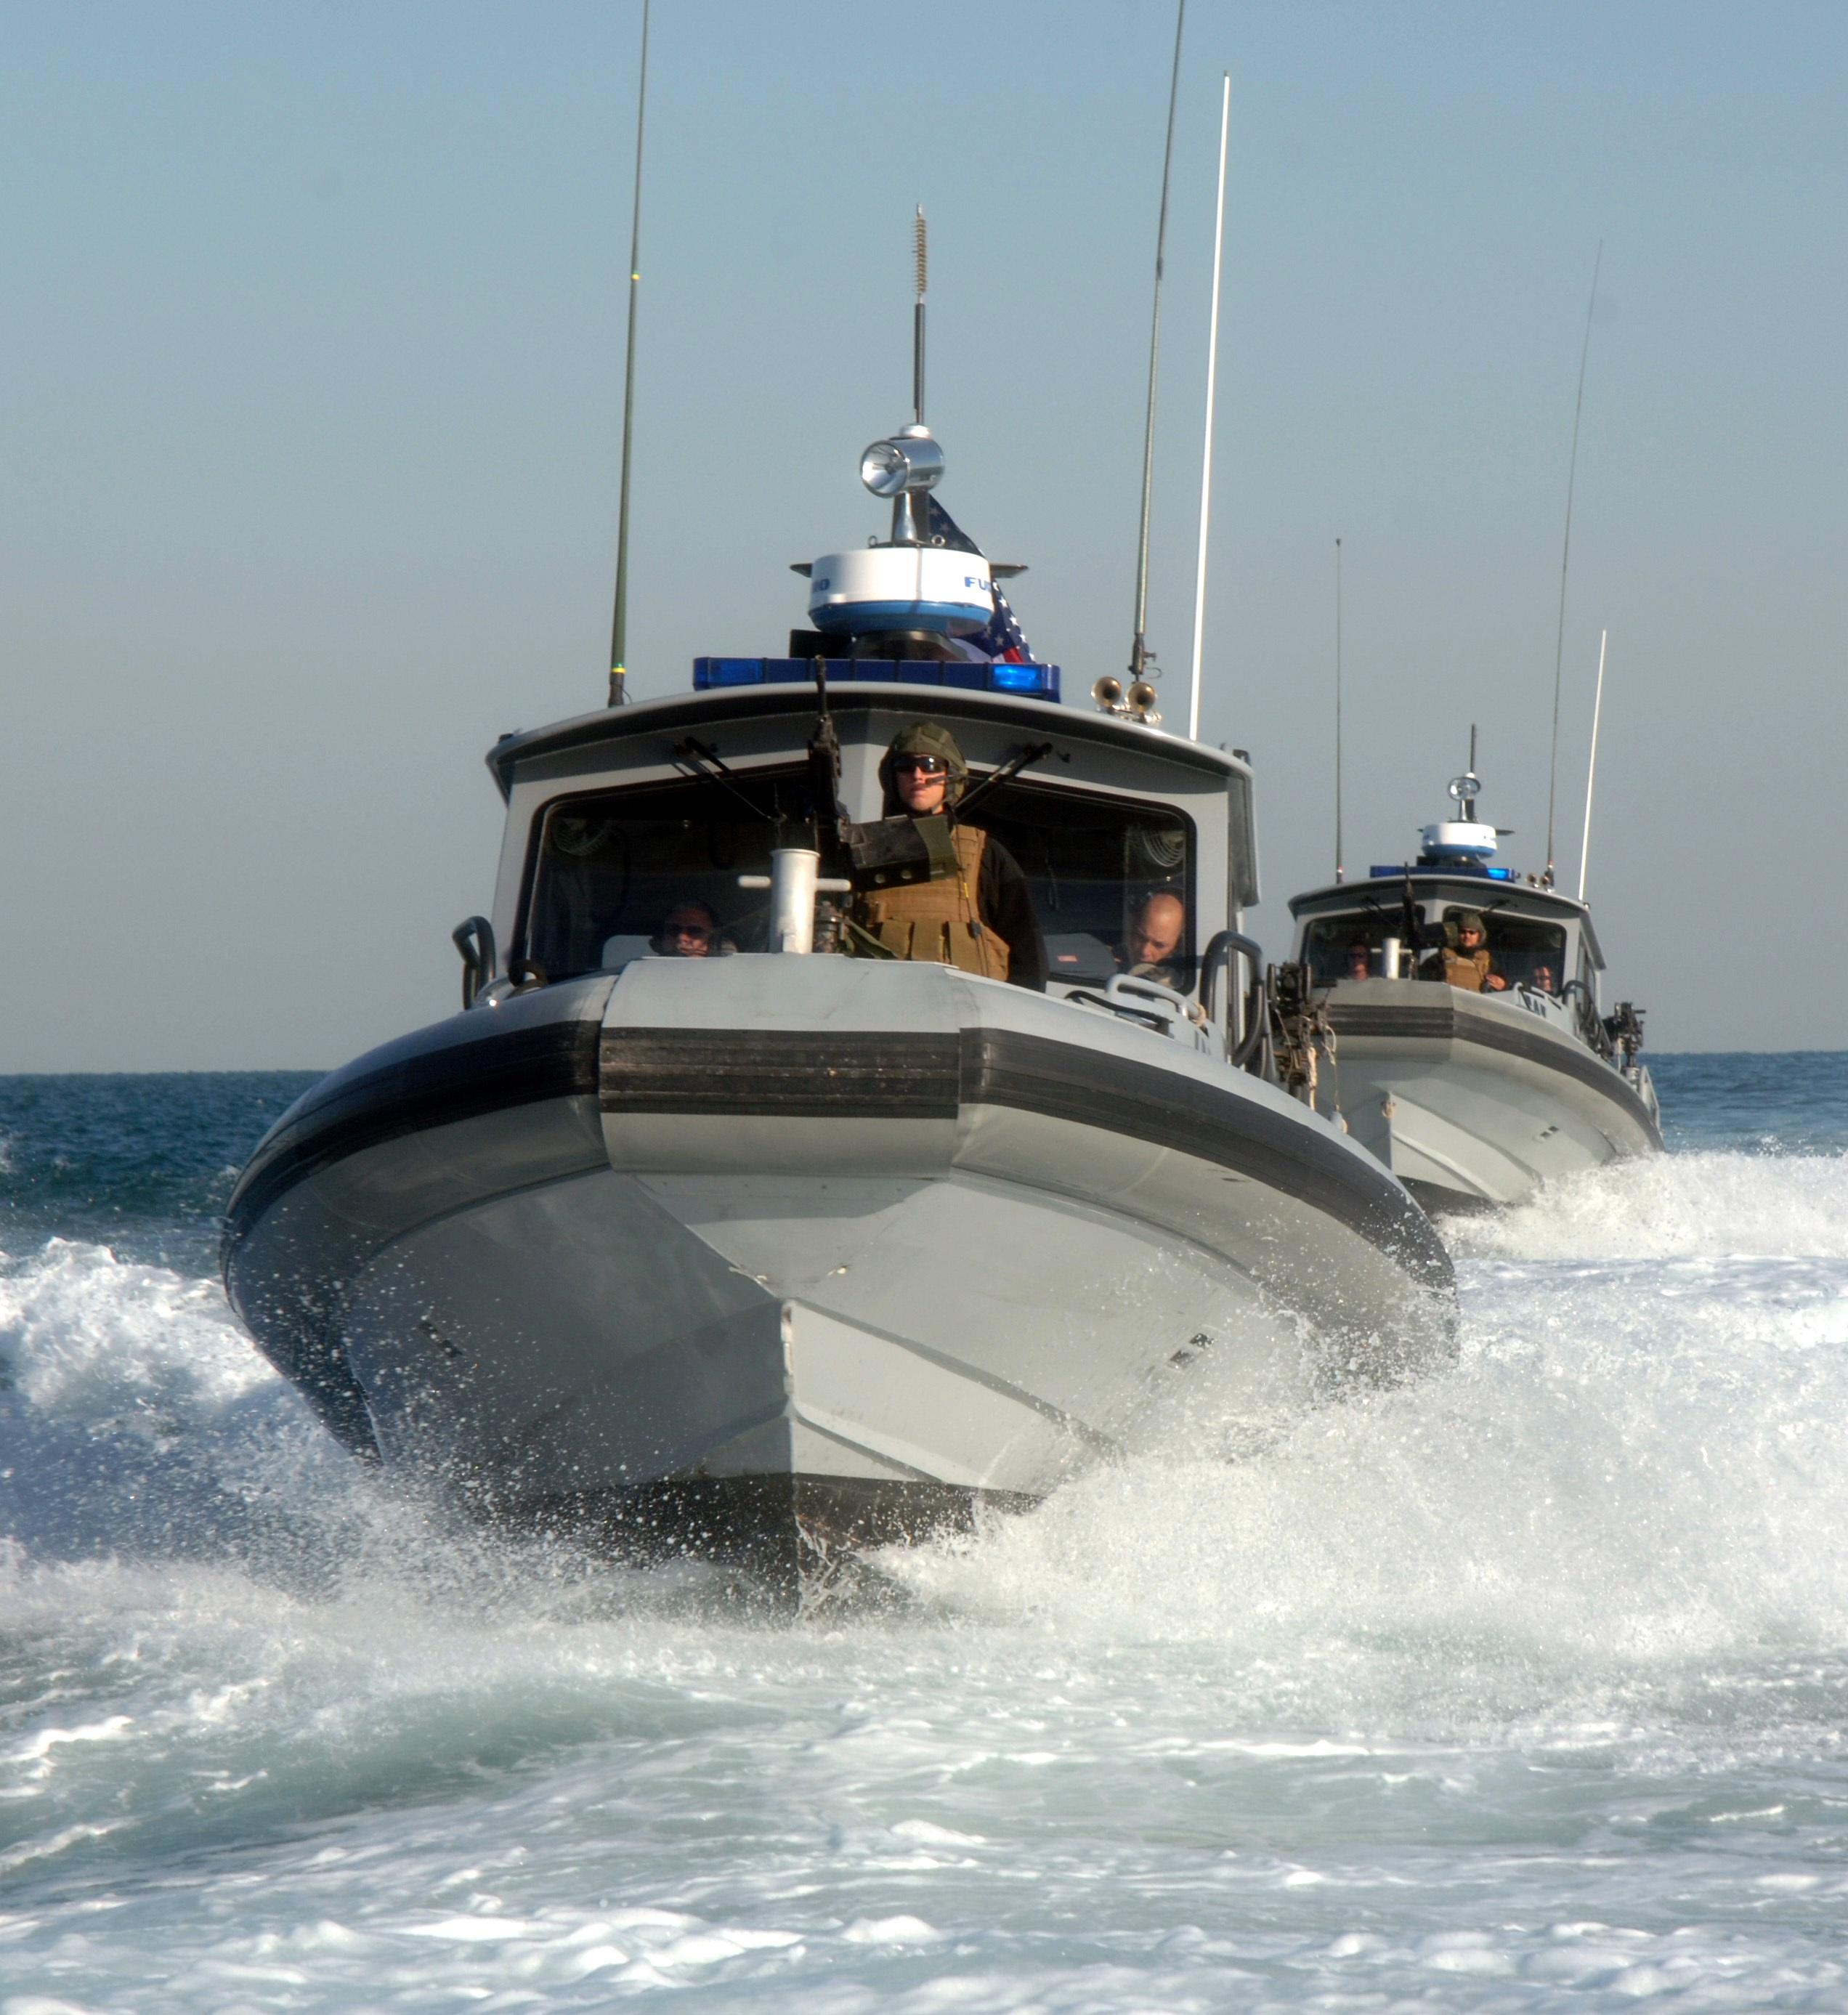 Military Ships, Activity, Military, Ocean, Patrol, HQ Photo